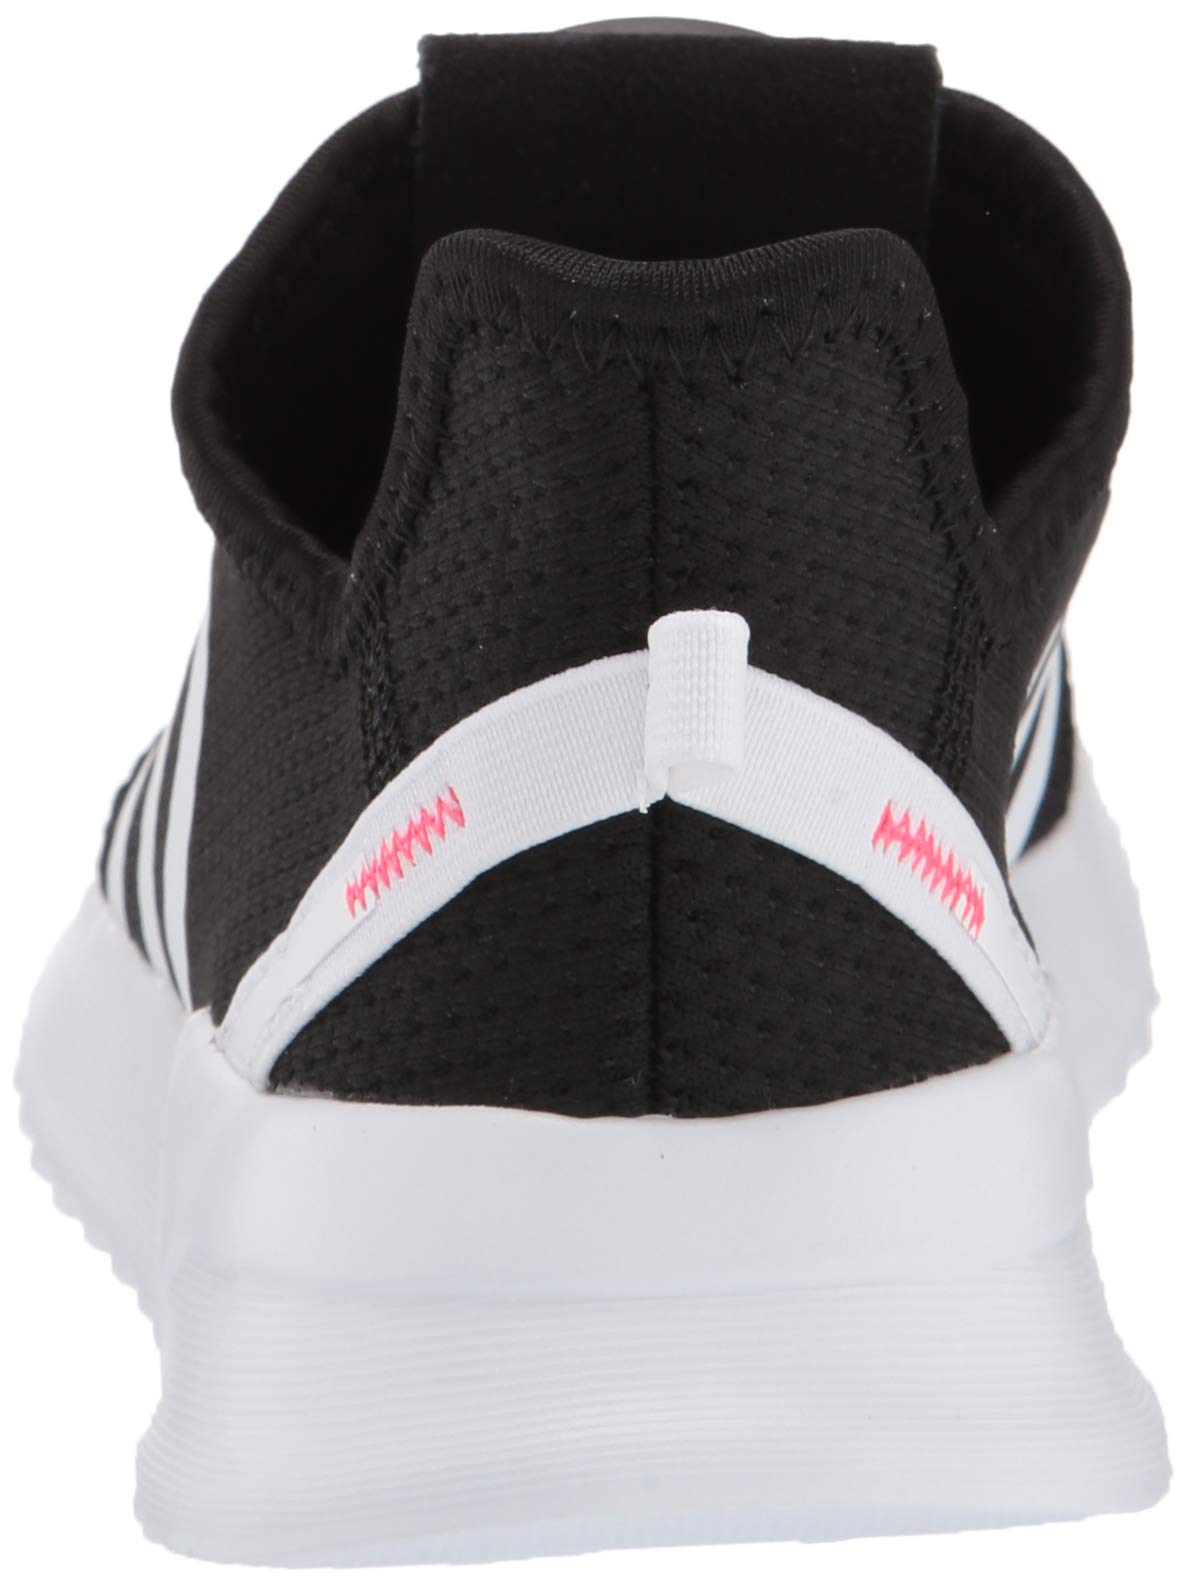 adidas Originals Baby U_Path Running Shoe Black/White/Shock red 6K M US Toddler by adidas Originals (Image #2)